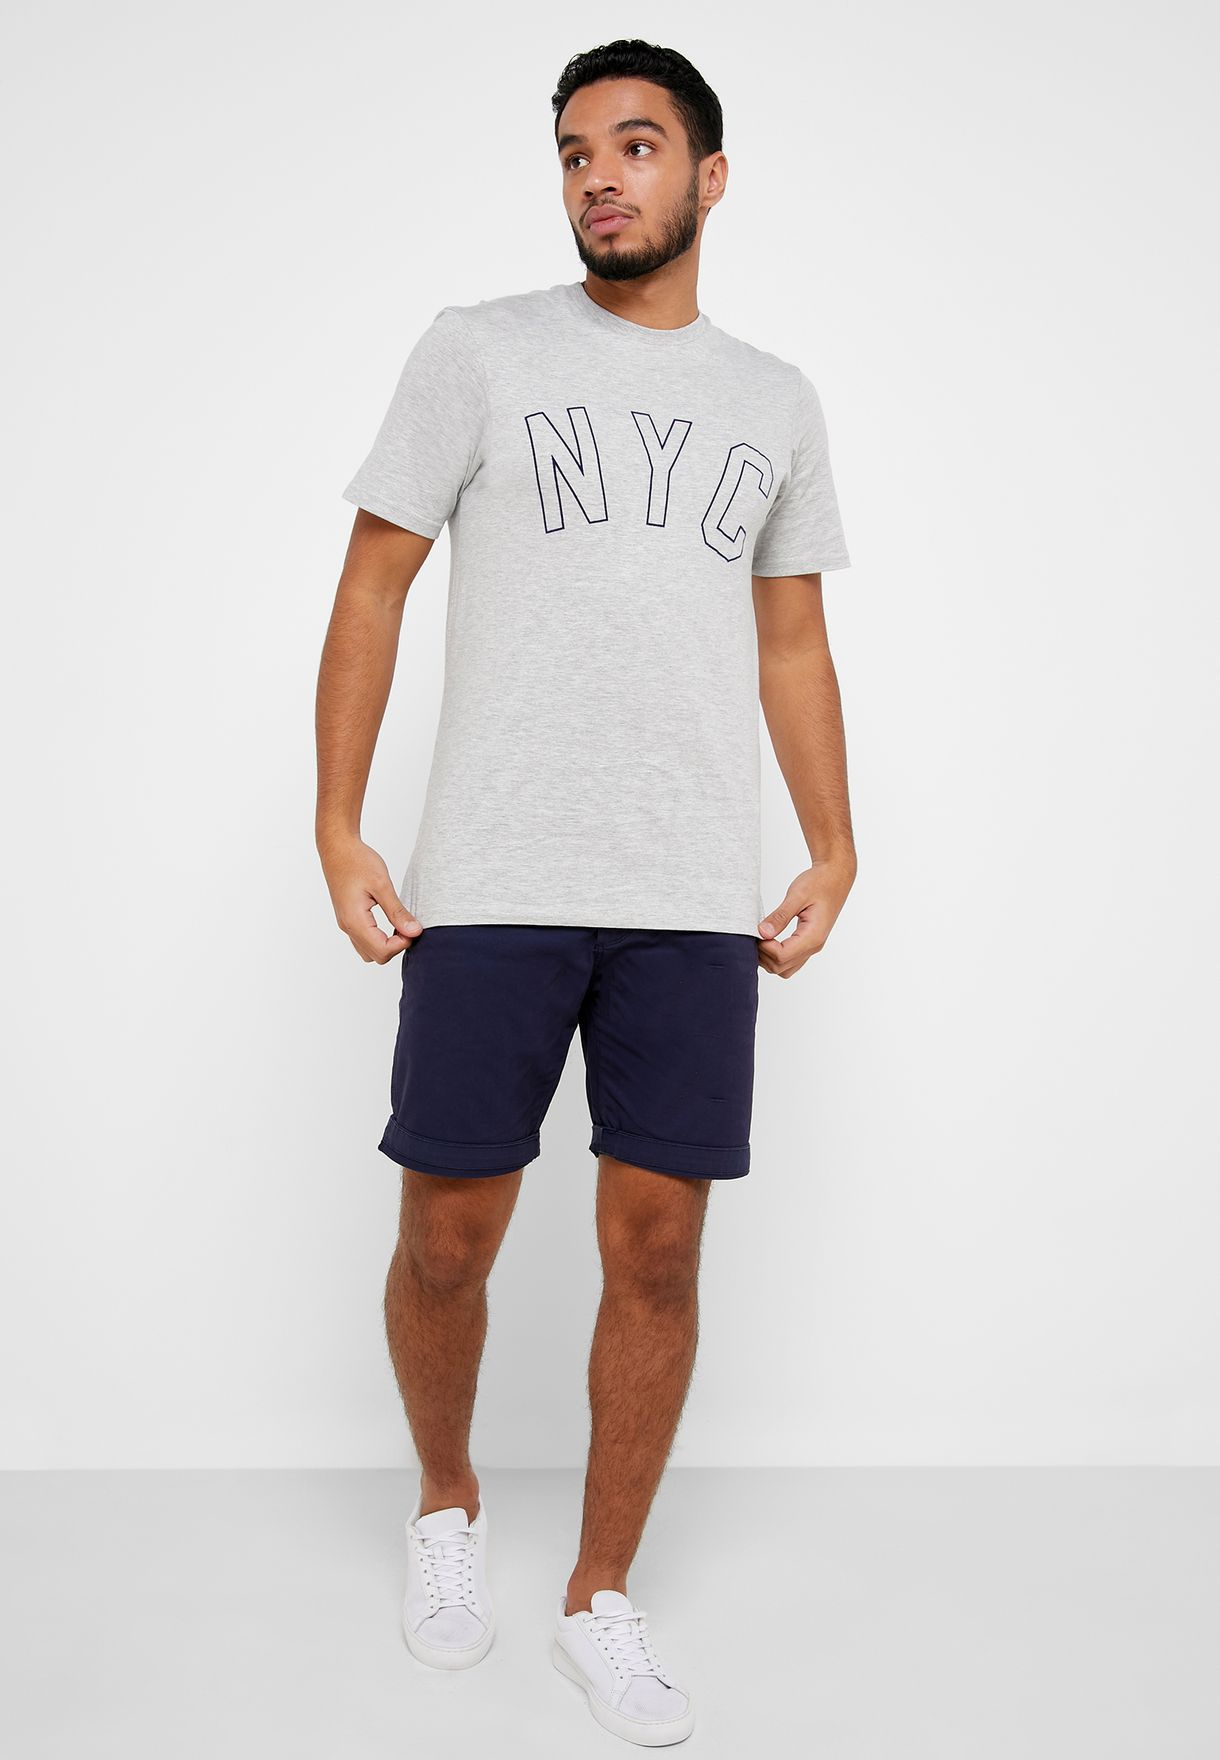 NYC Crew Neck T-Shirt